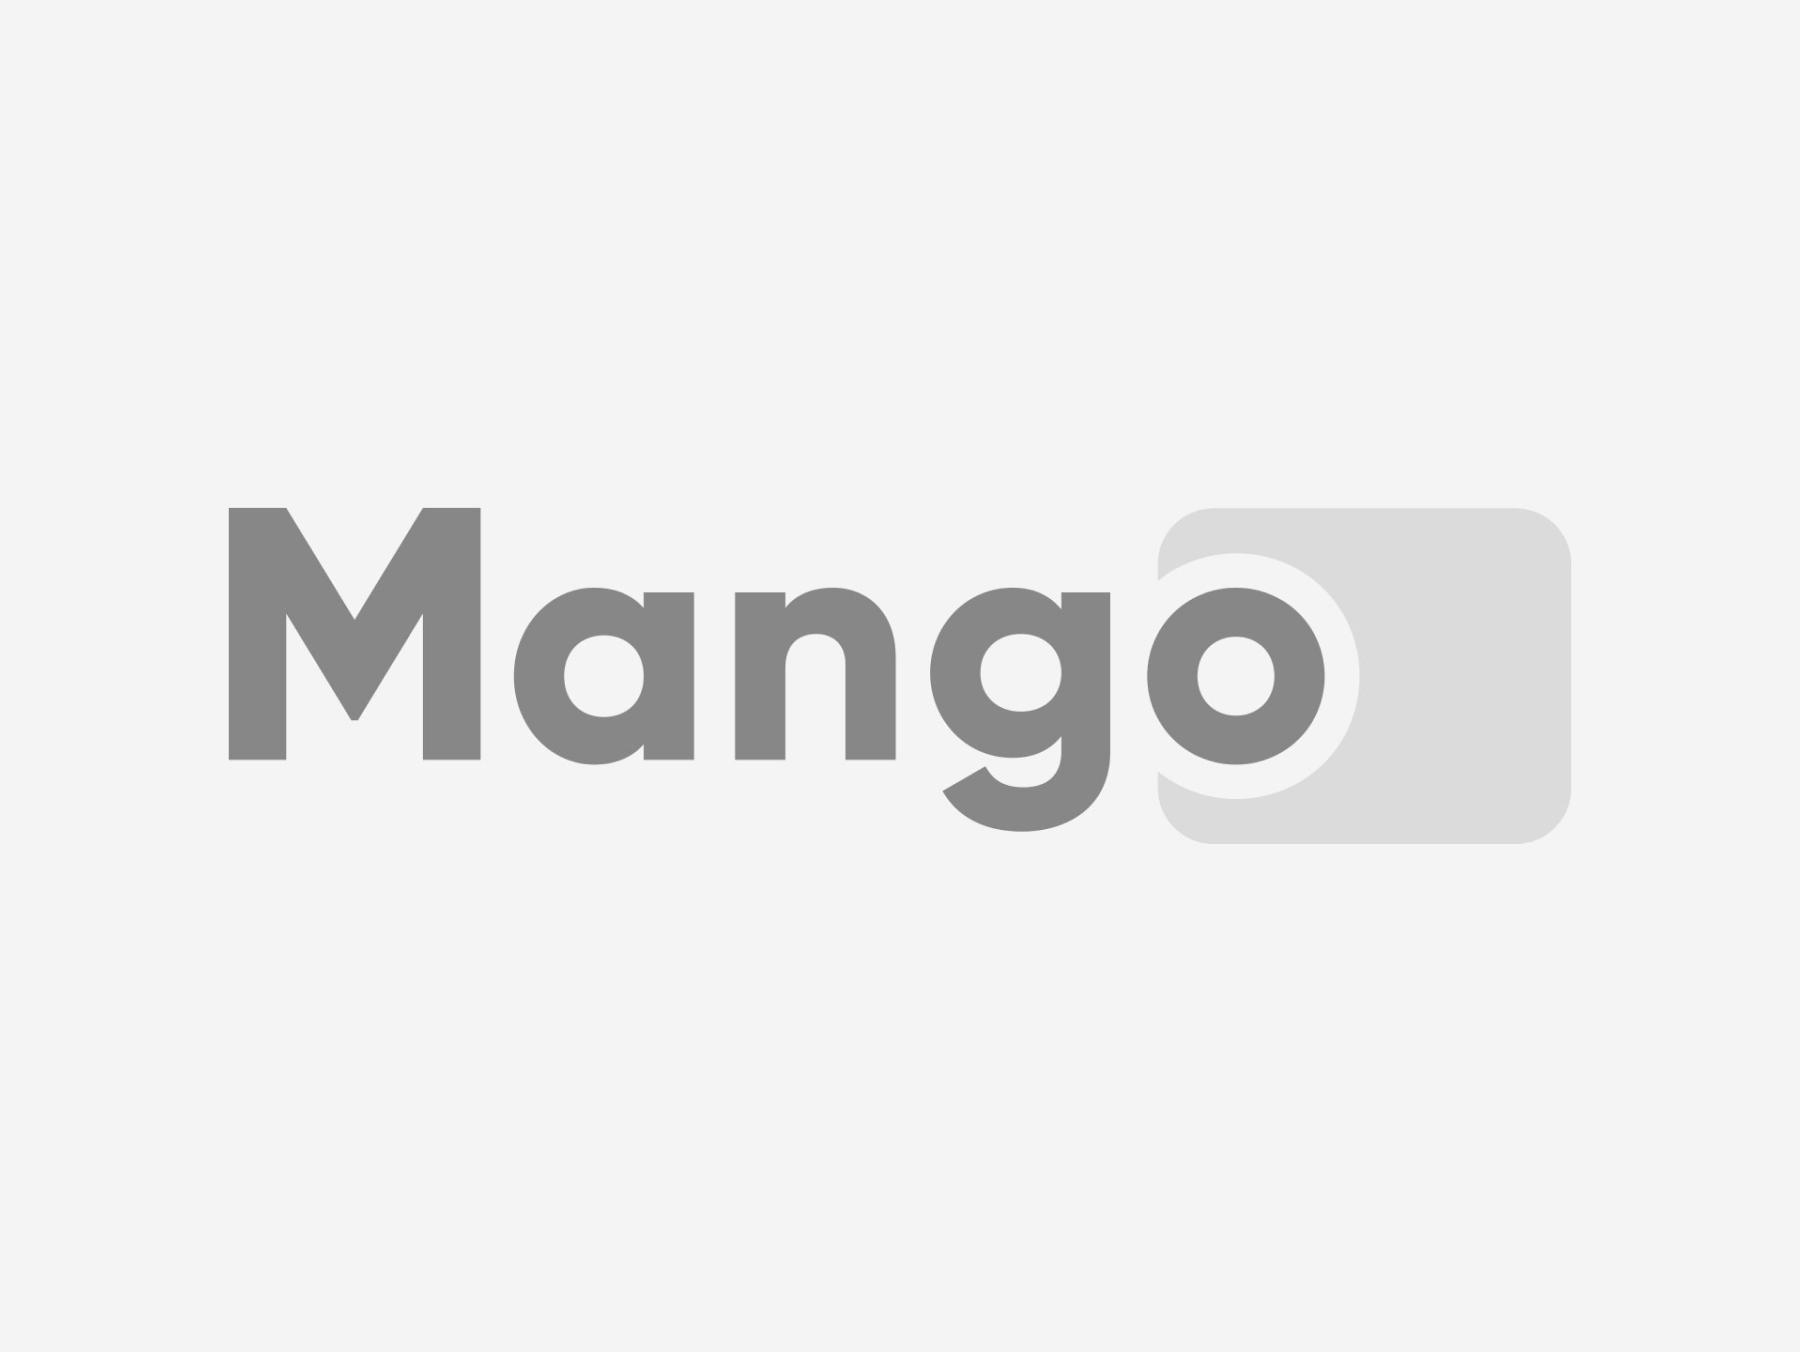 Sandale Cork Walkmaxx Trend Walkmaxx Trend